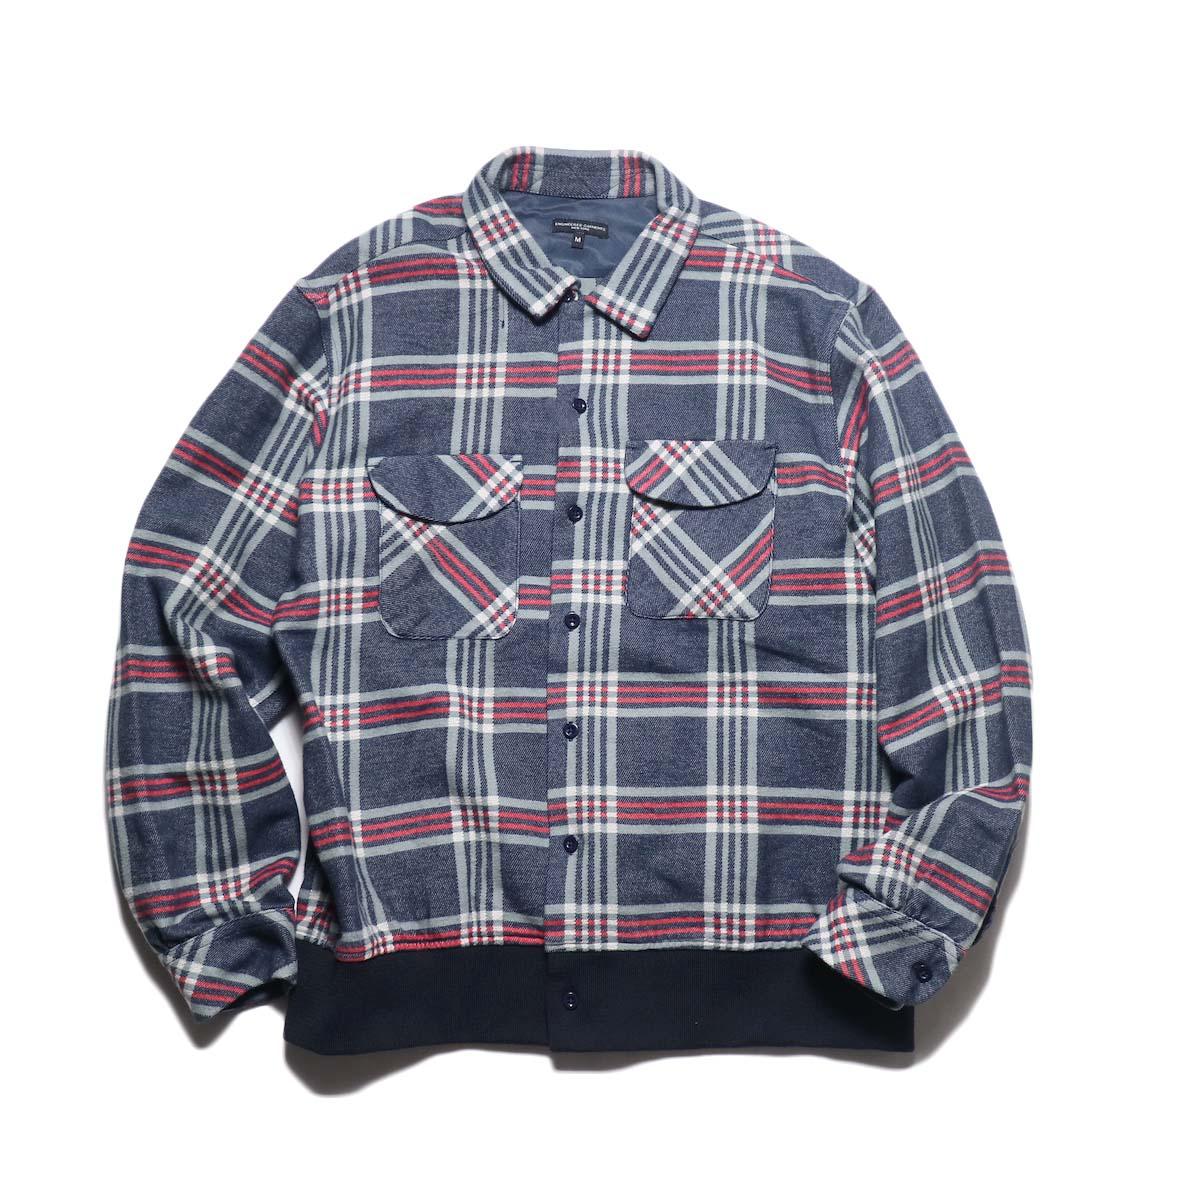 Engineered Garments / Classic Shirt -Big Plaid (Navy / Teal / Red)